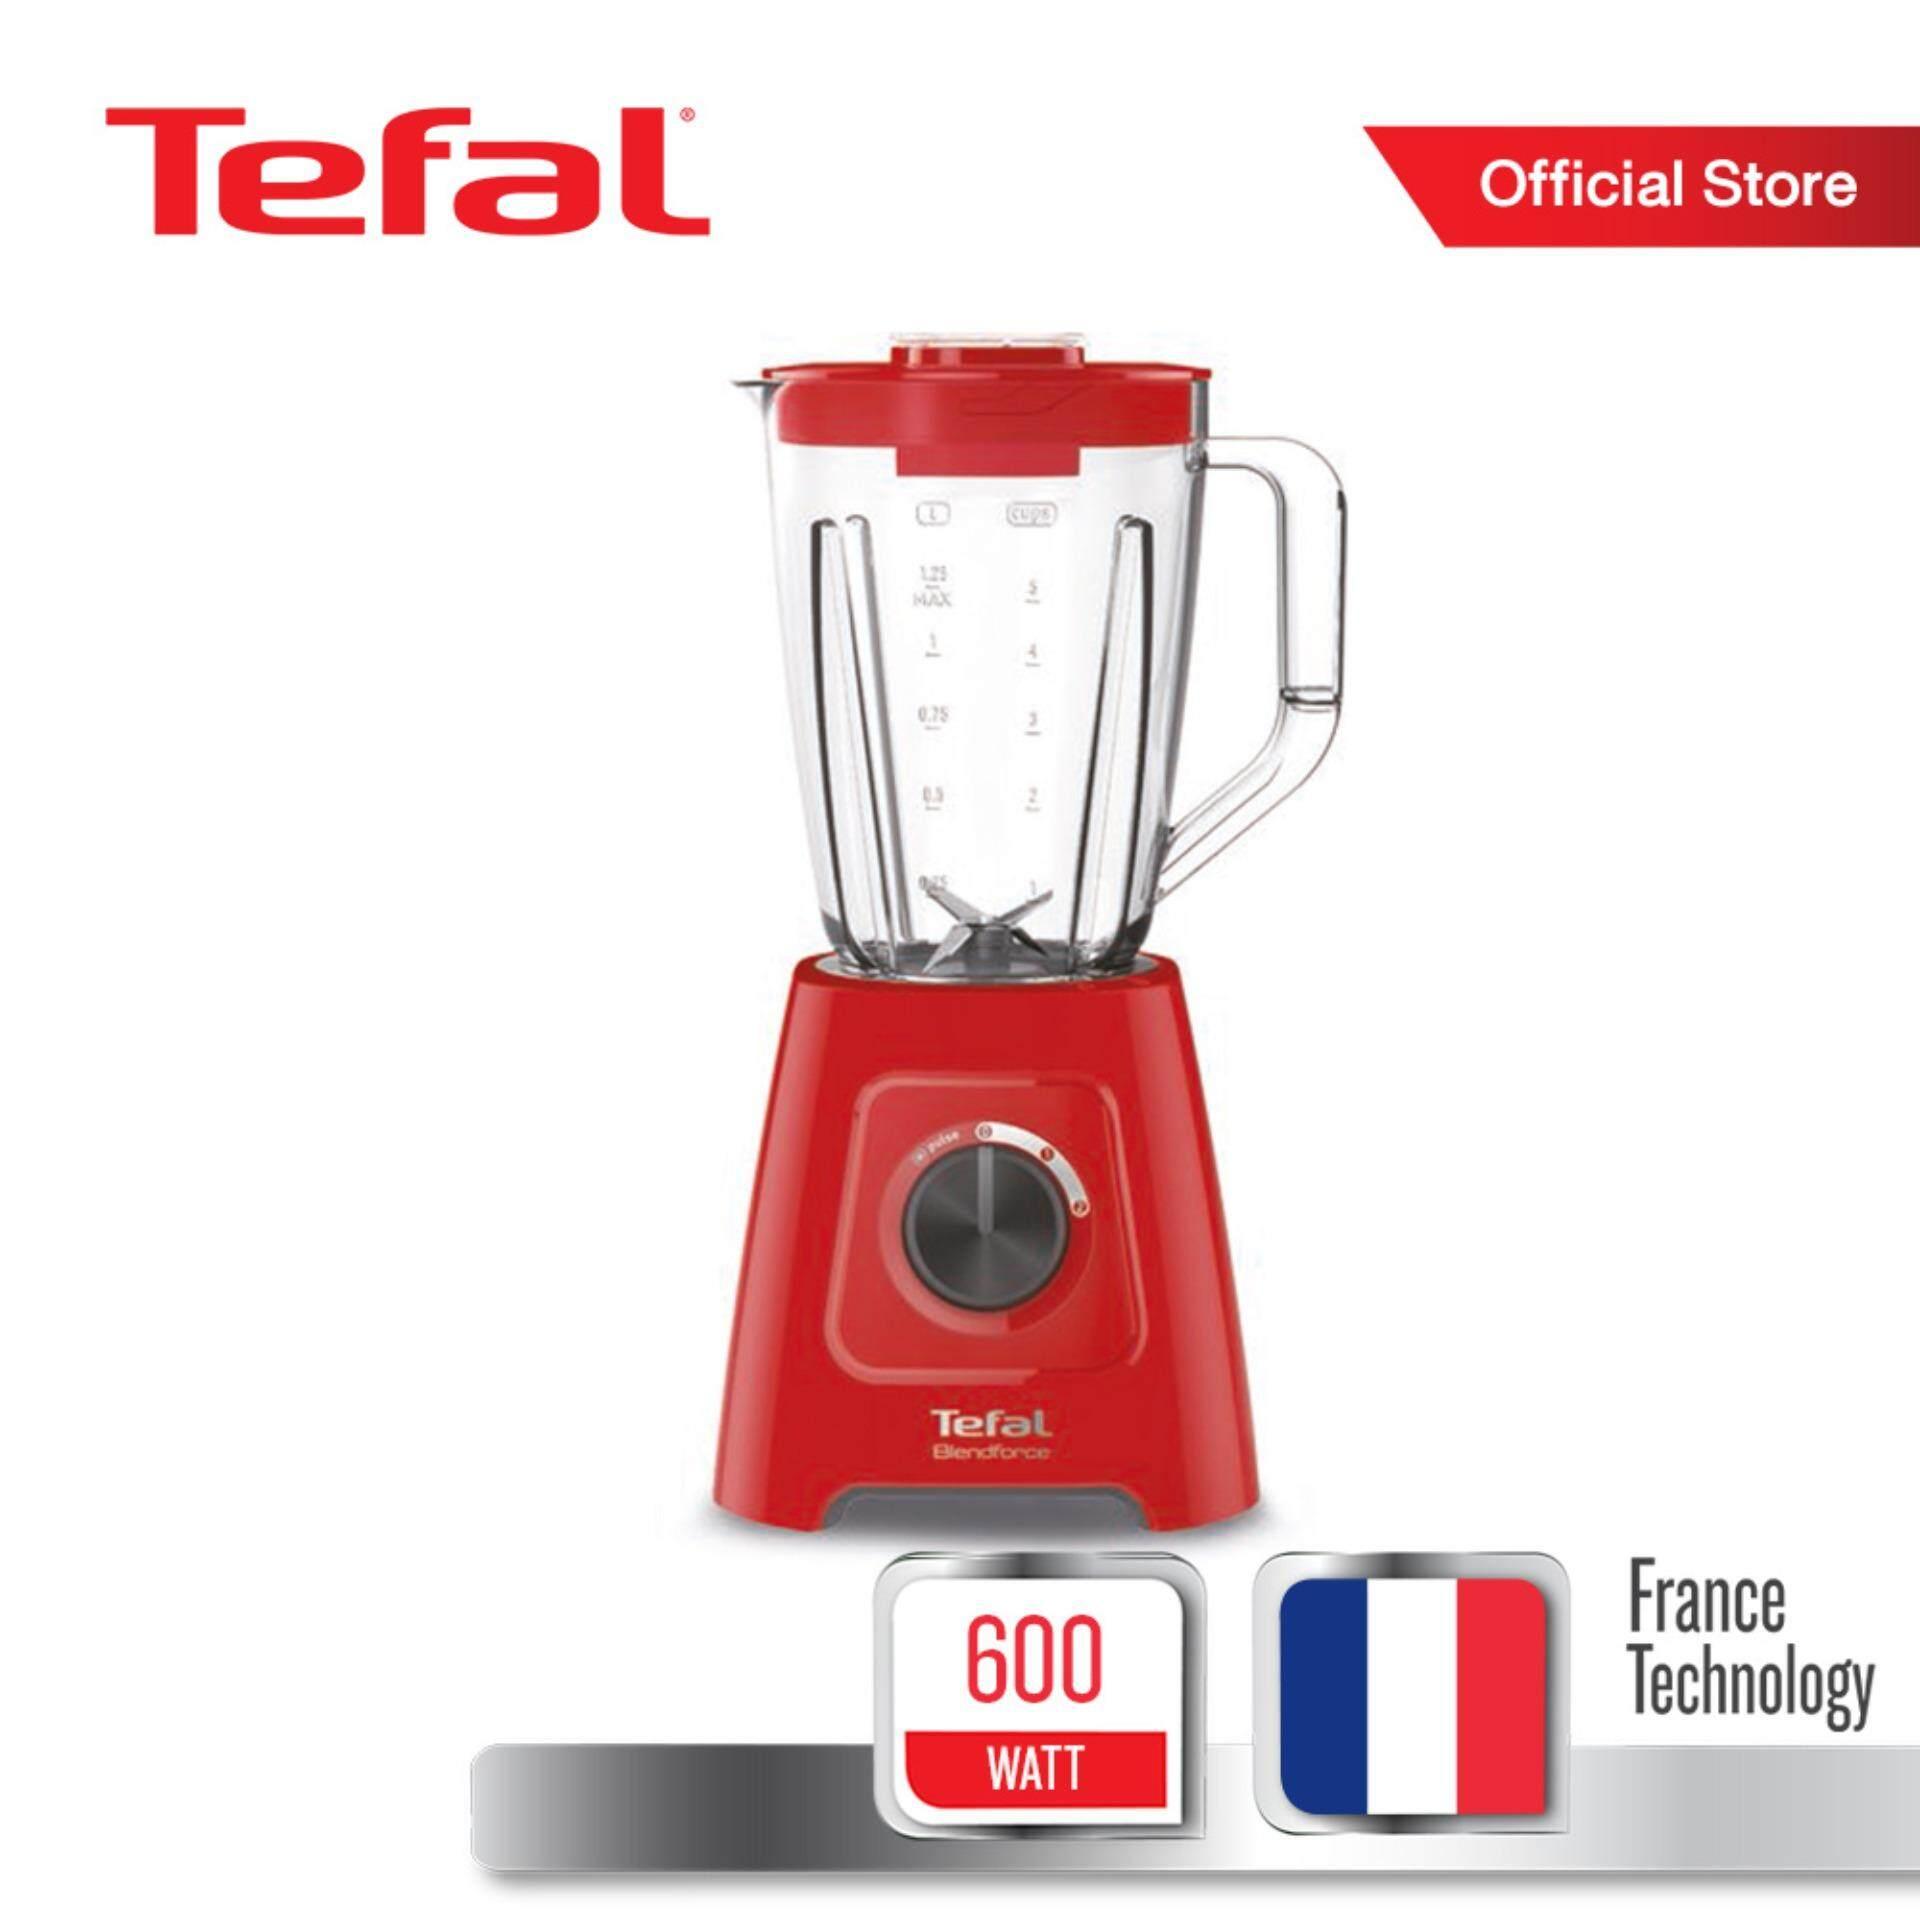 [Online Exclusive] Tefal เครื่องปั่นอเนกประสงค์ กำลังไฟ 600 วัตต์ ขนาดความจุ 1.7 ลิตร รุ่น BL420531 -Red